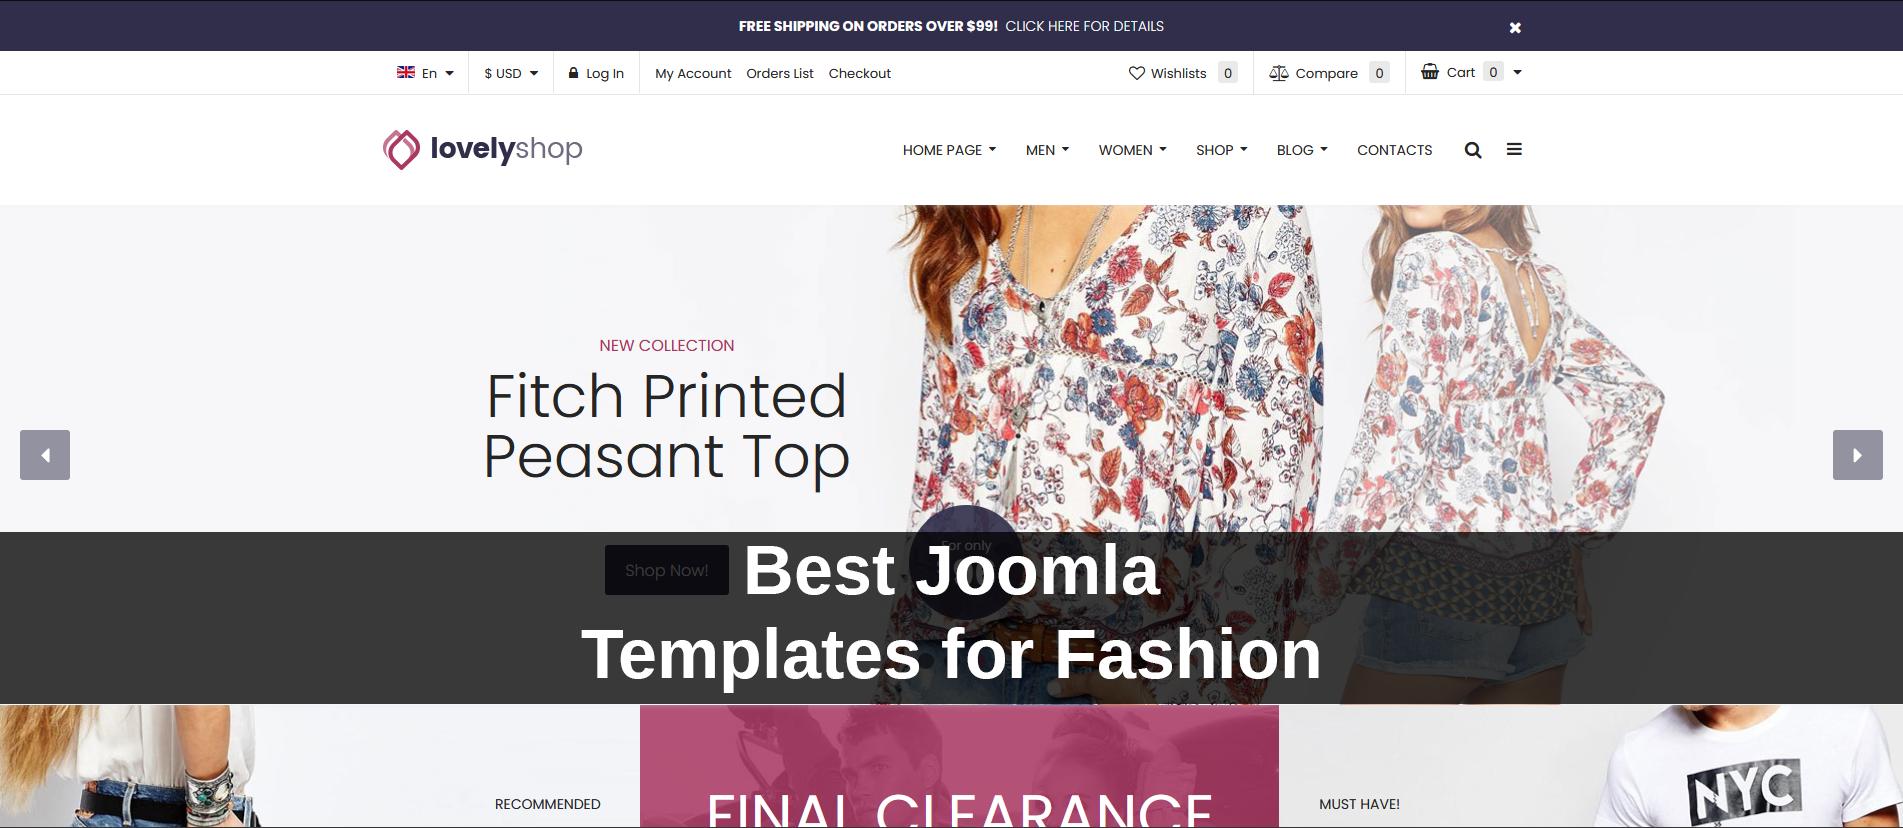 Best Joomla Templates for Fashion